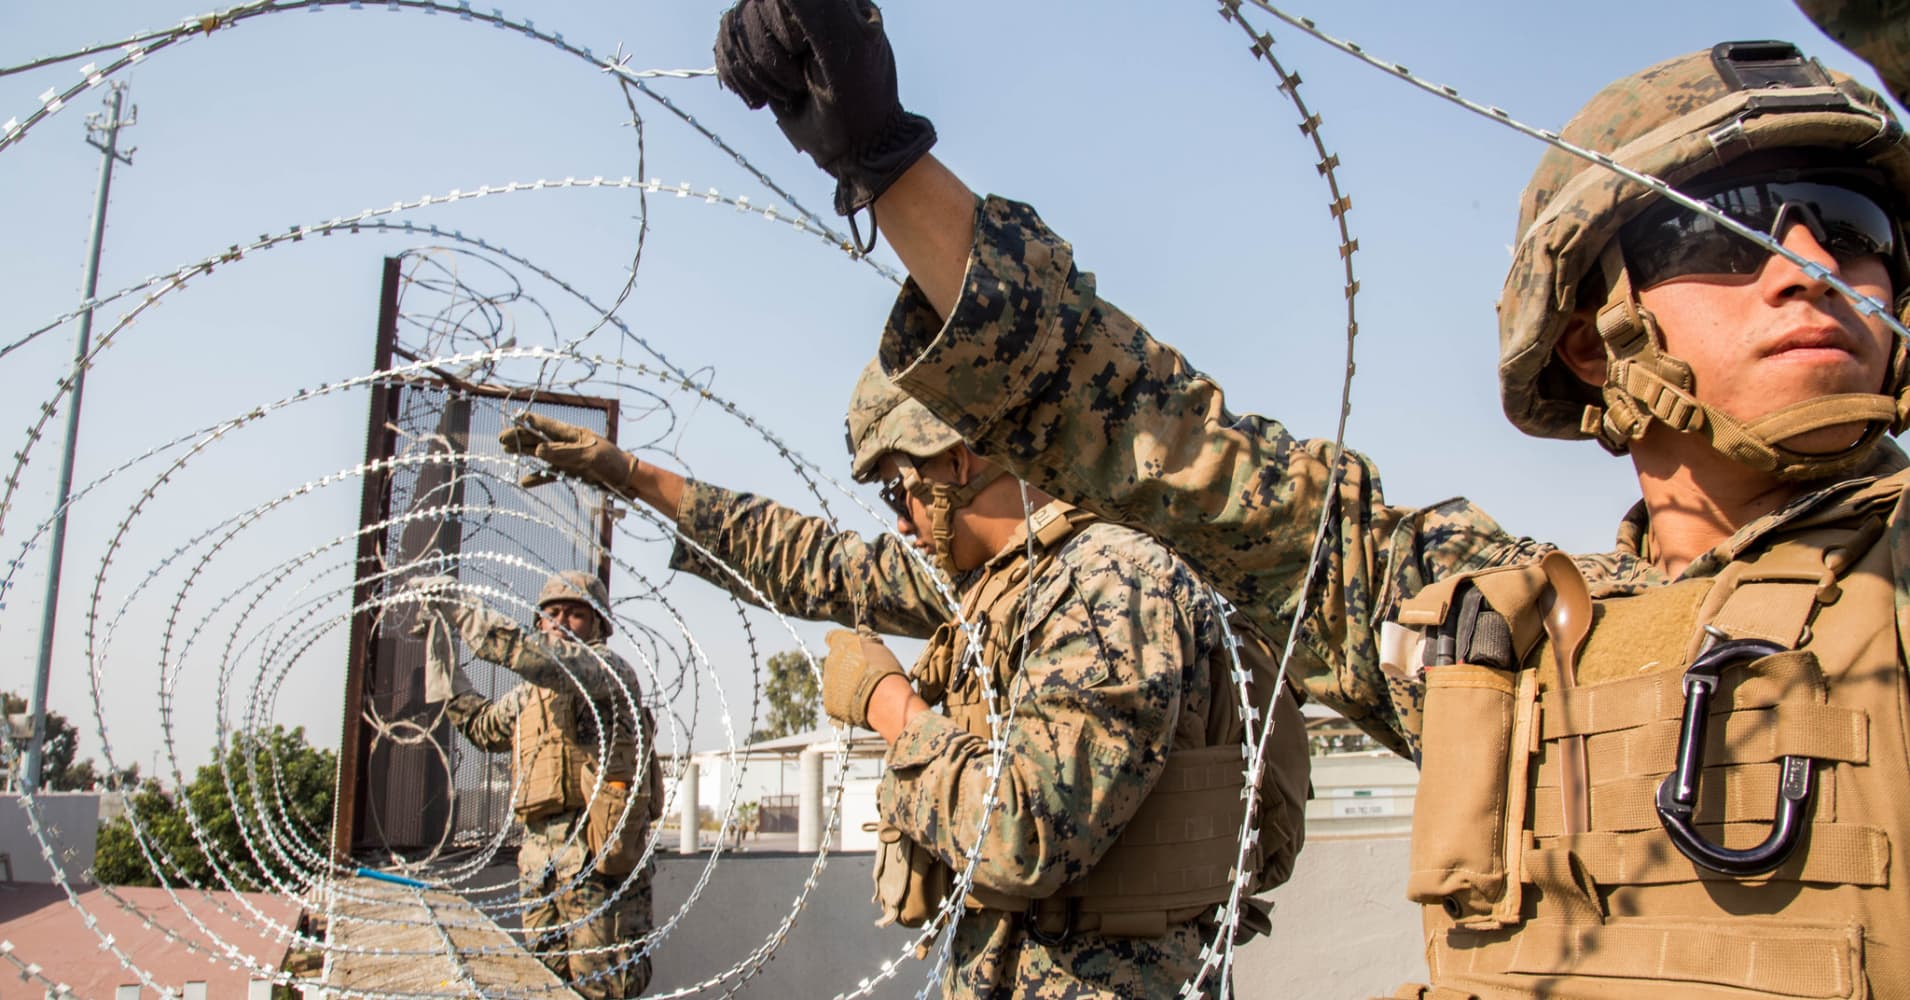 California Gov.-elect Newsom slams Trump border-closing threat as 'irresponsible, irrational'